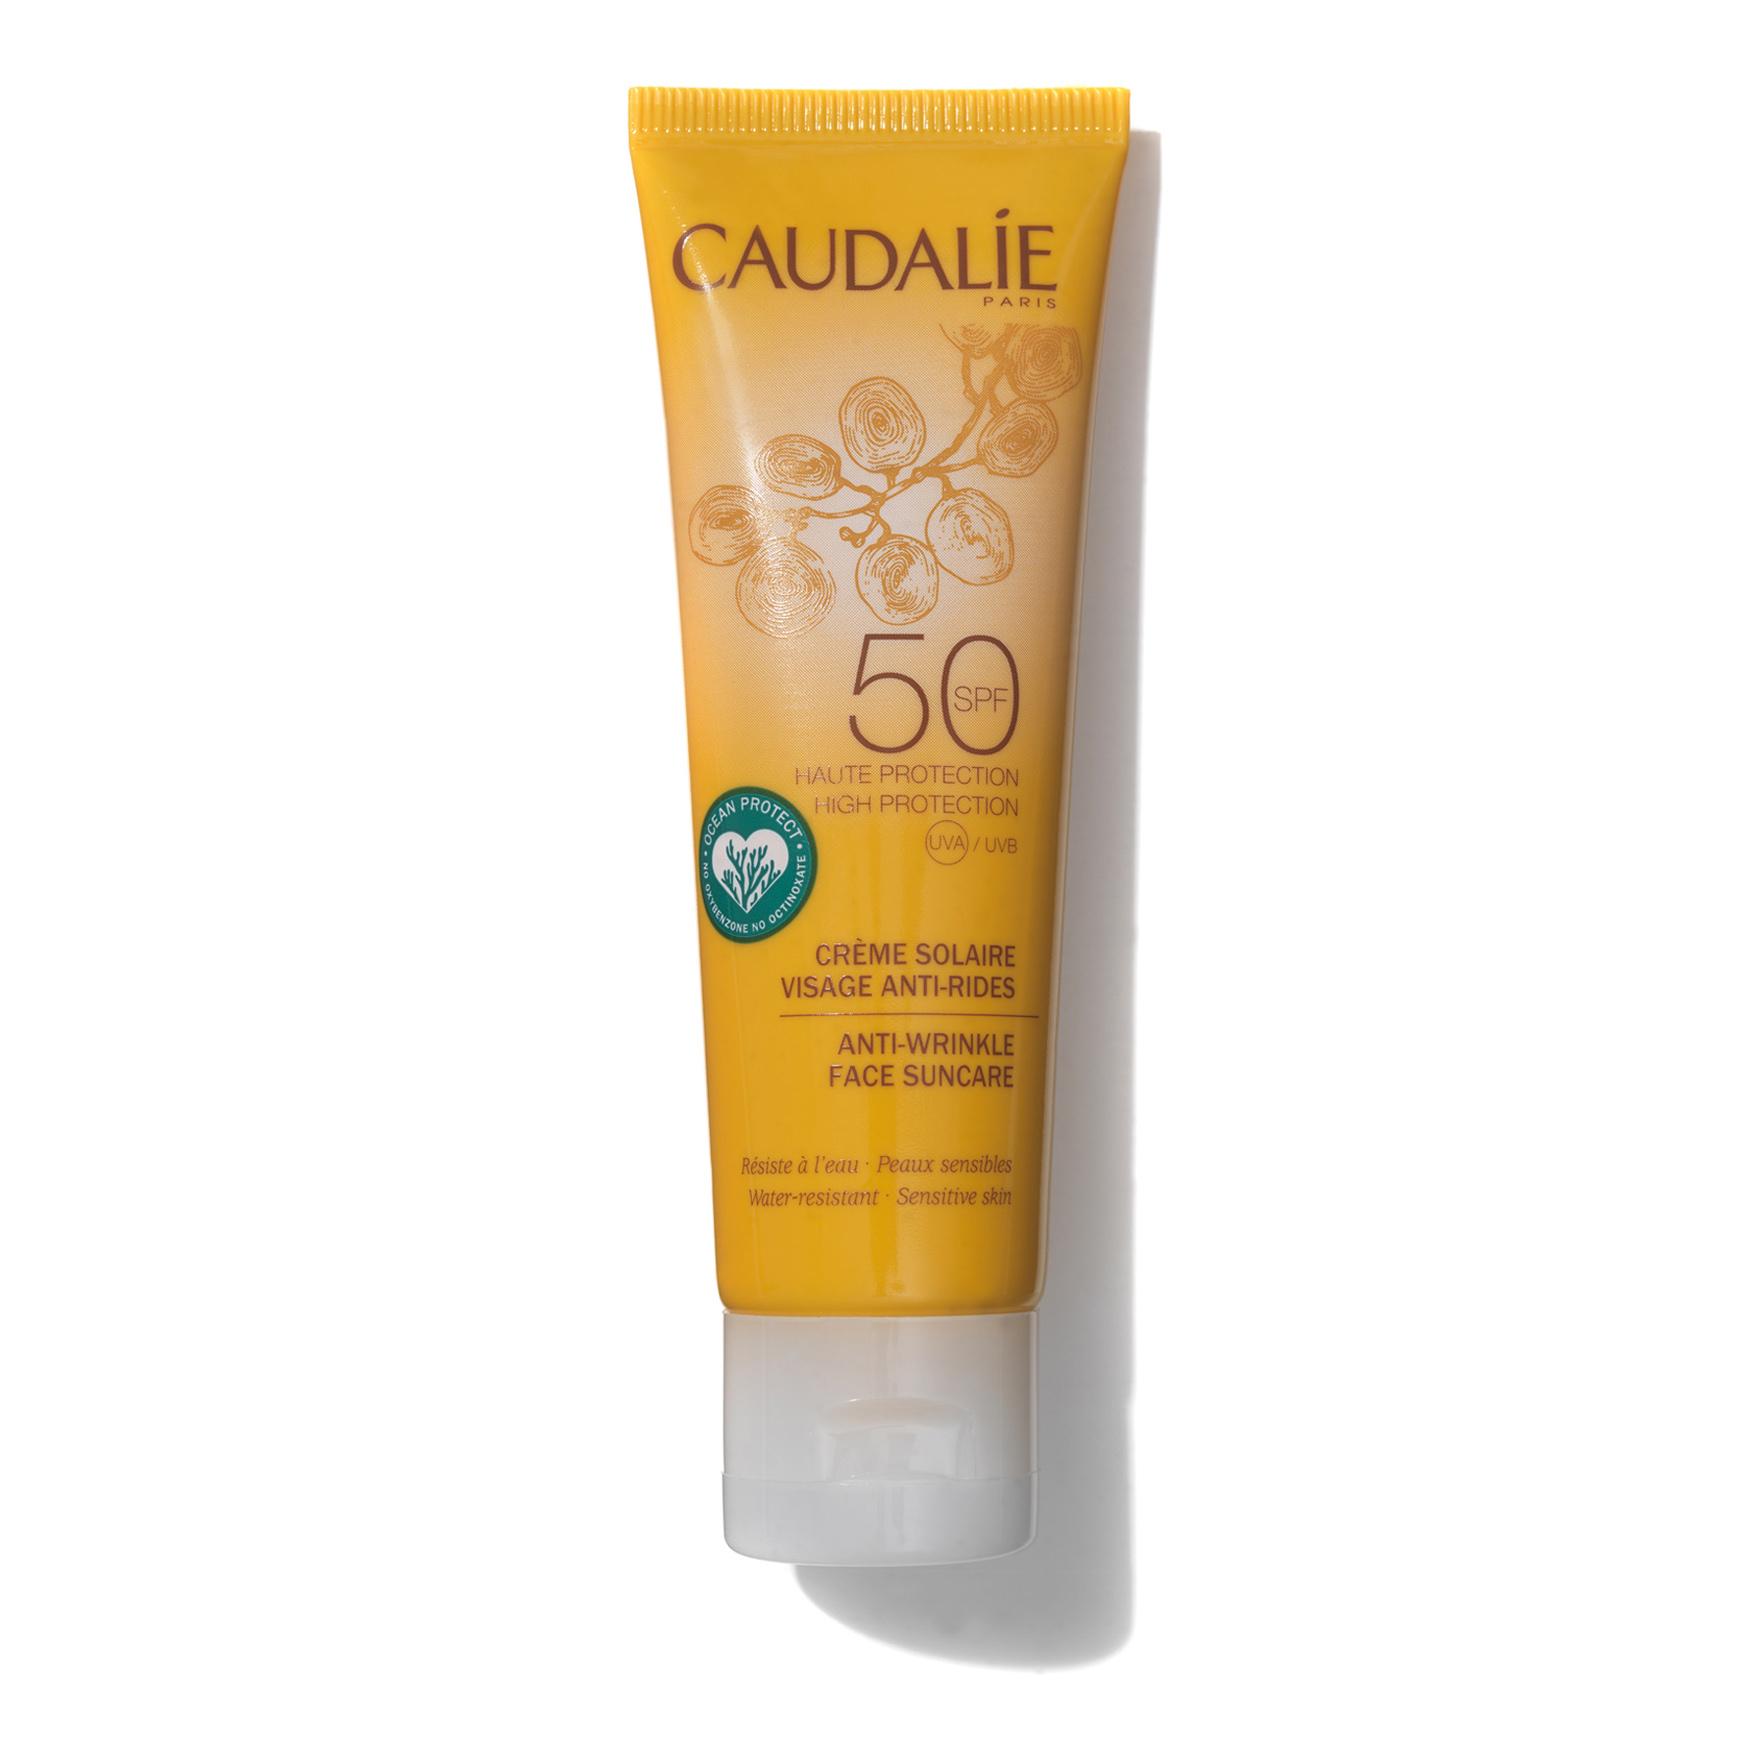 Anti-Wrinkle Face Suncare SPF50, , large